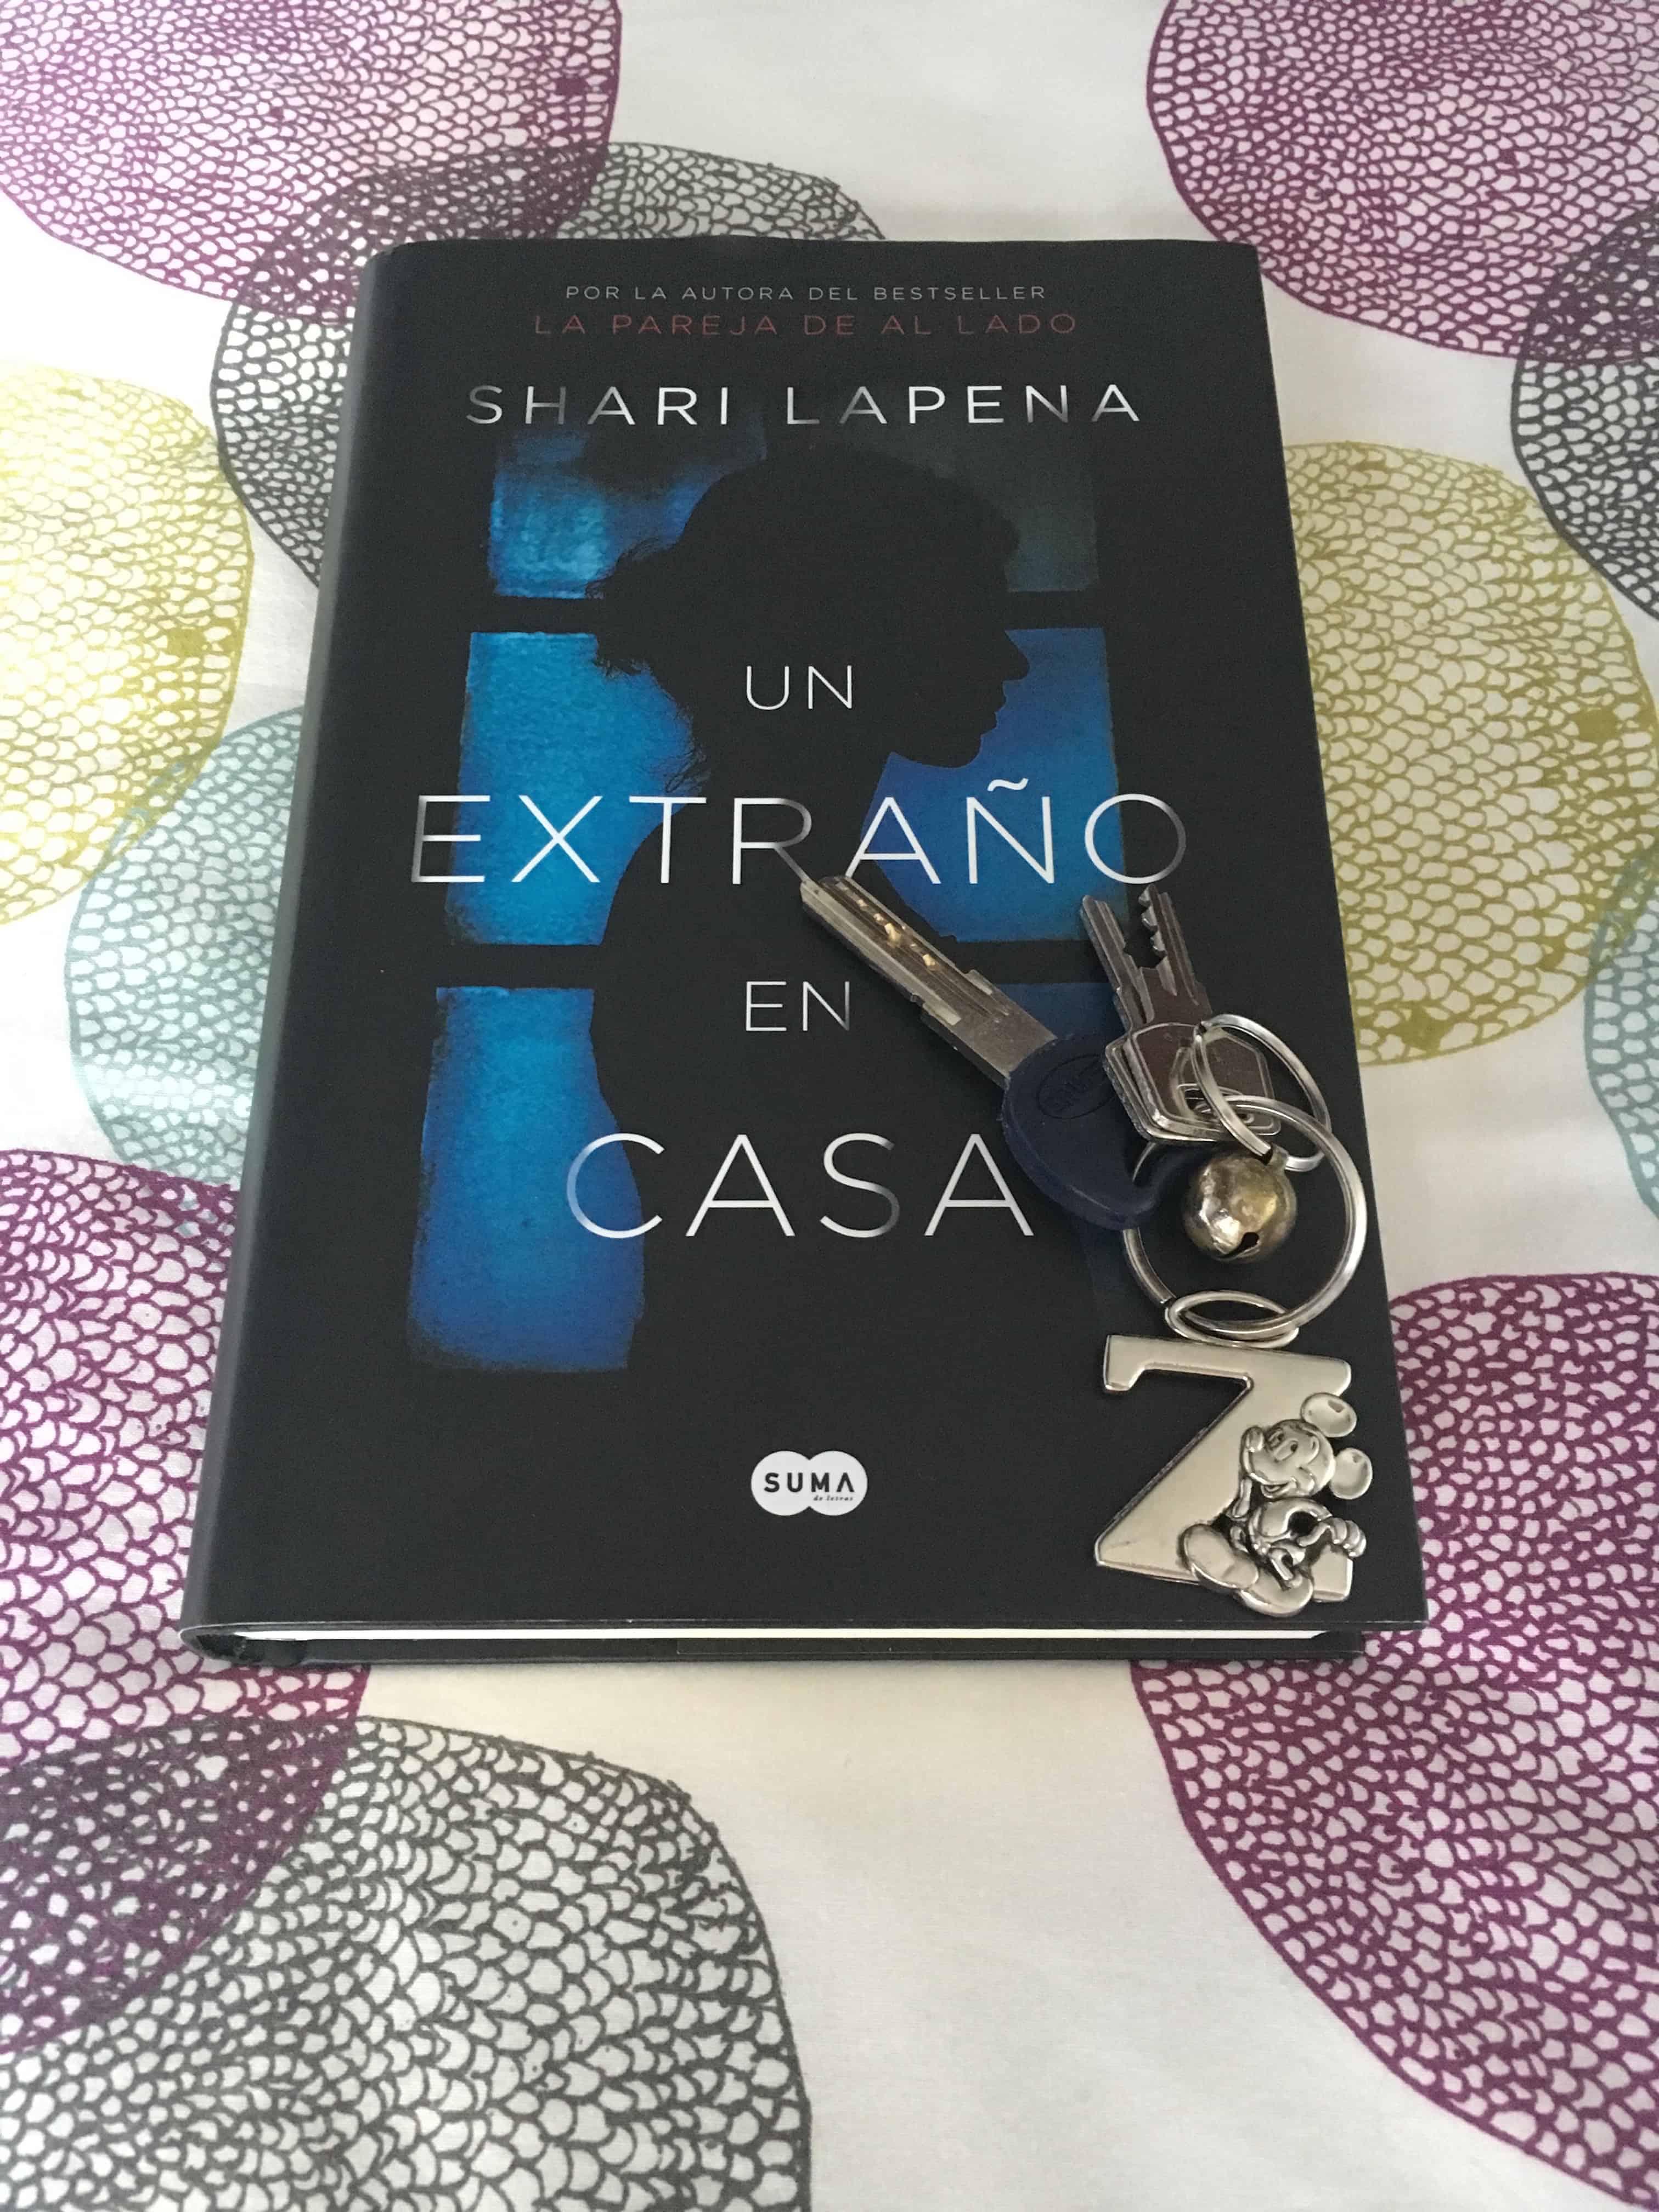 UN EXTRAÑO EN CASA, de Shari Lapena